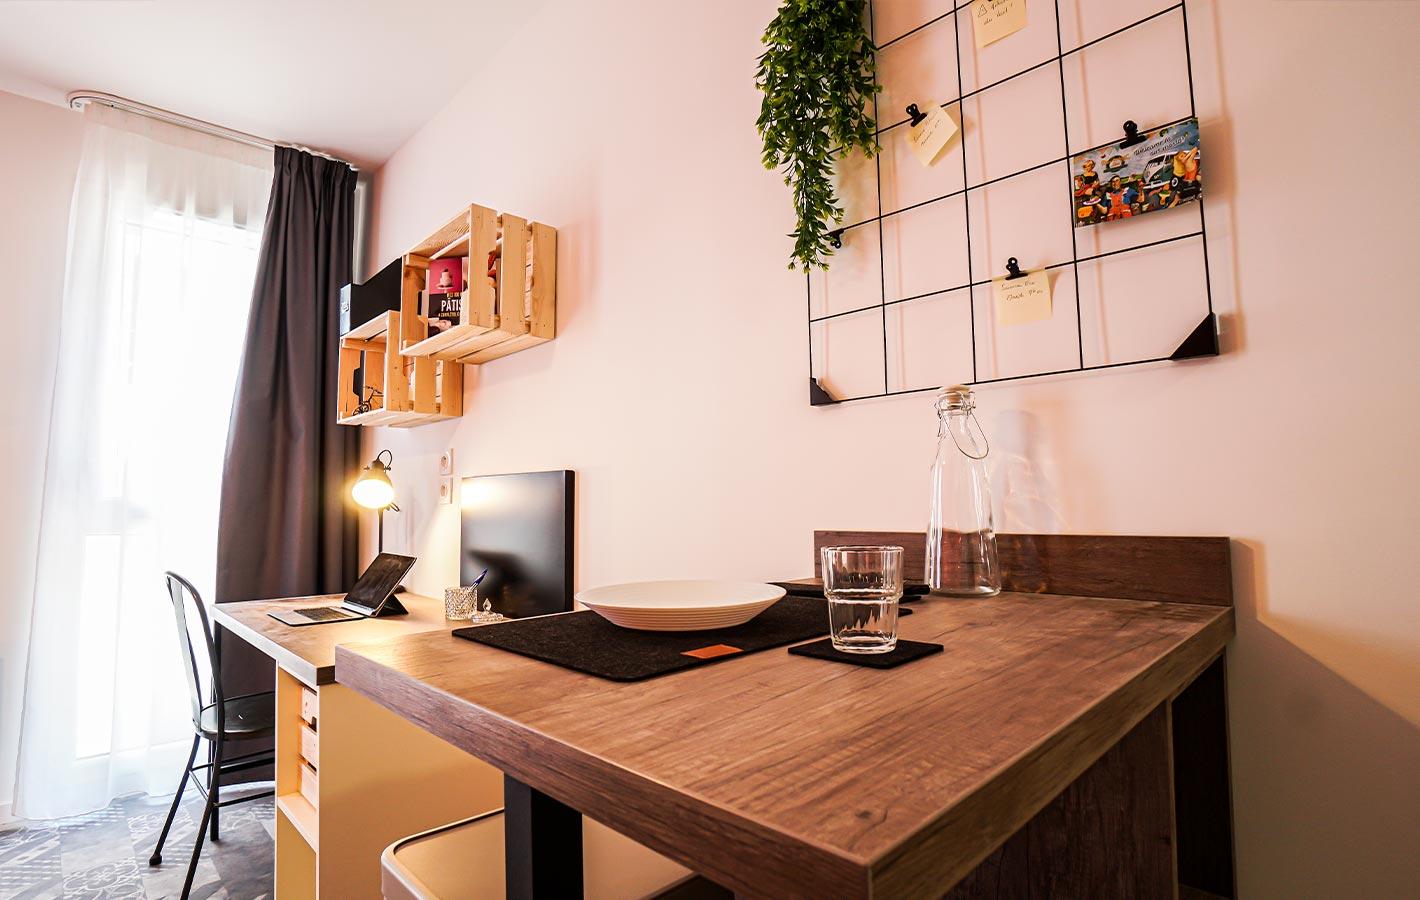 image  2021 06 14 residence etudiante suitetudes biscuiterie caen studio table